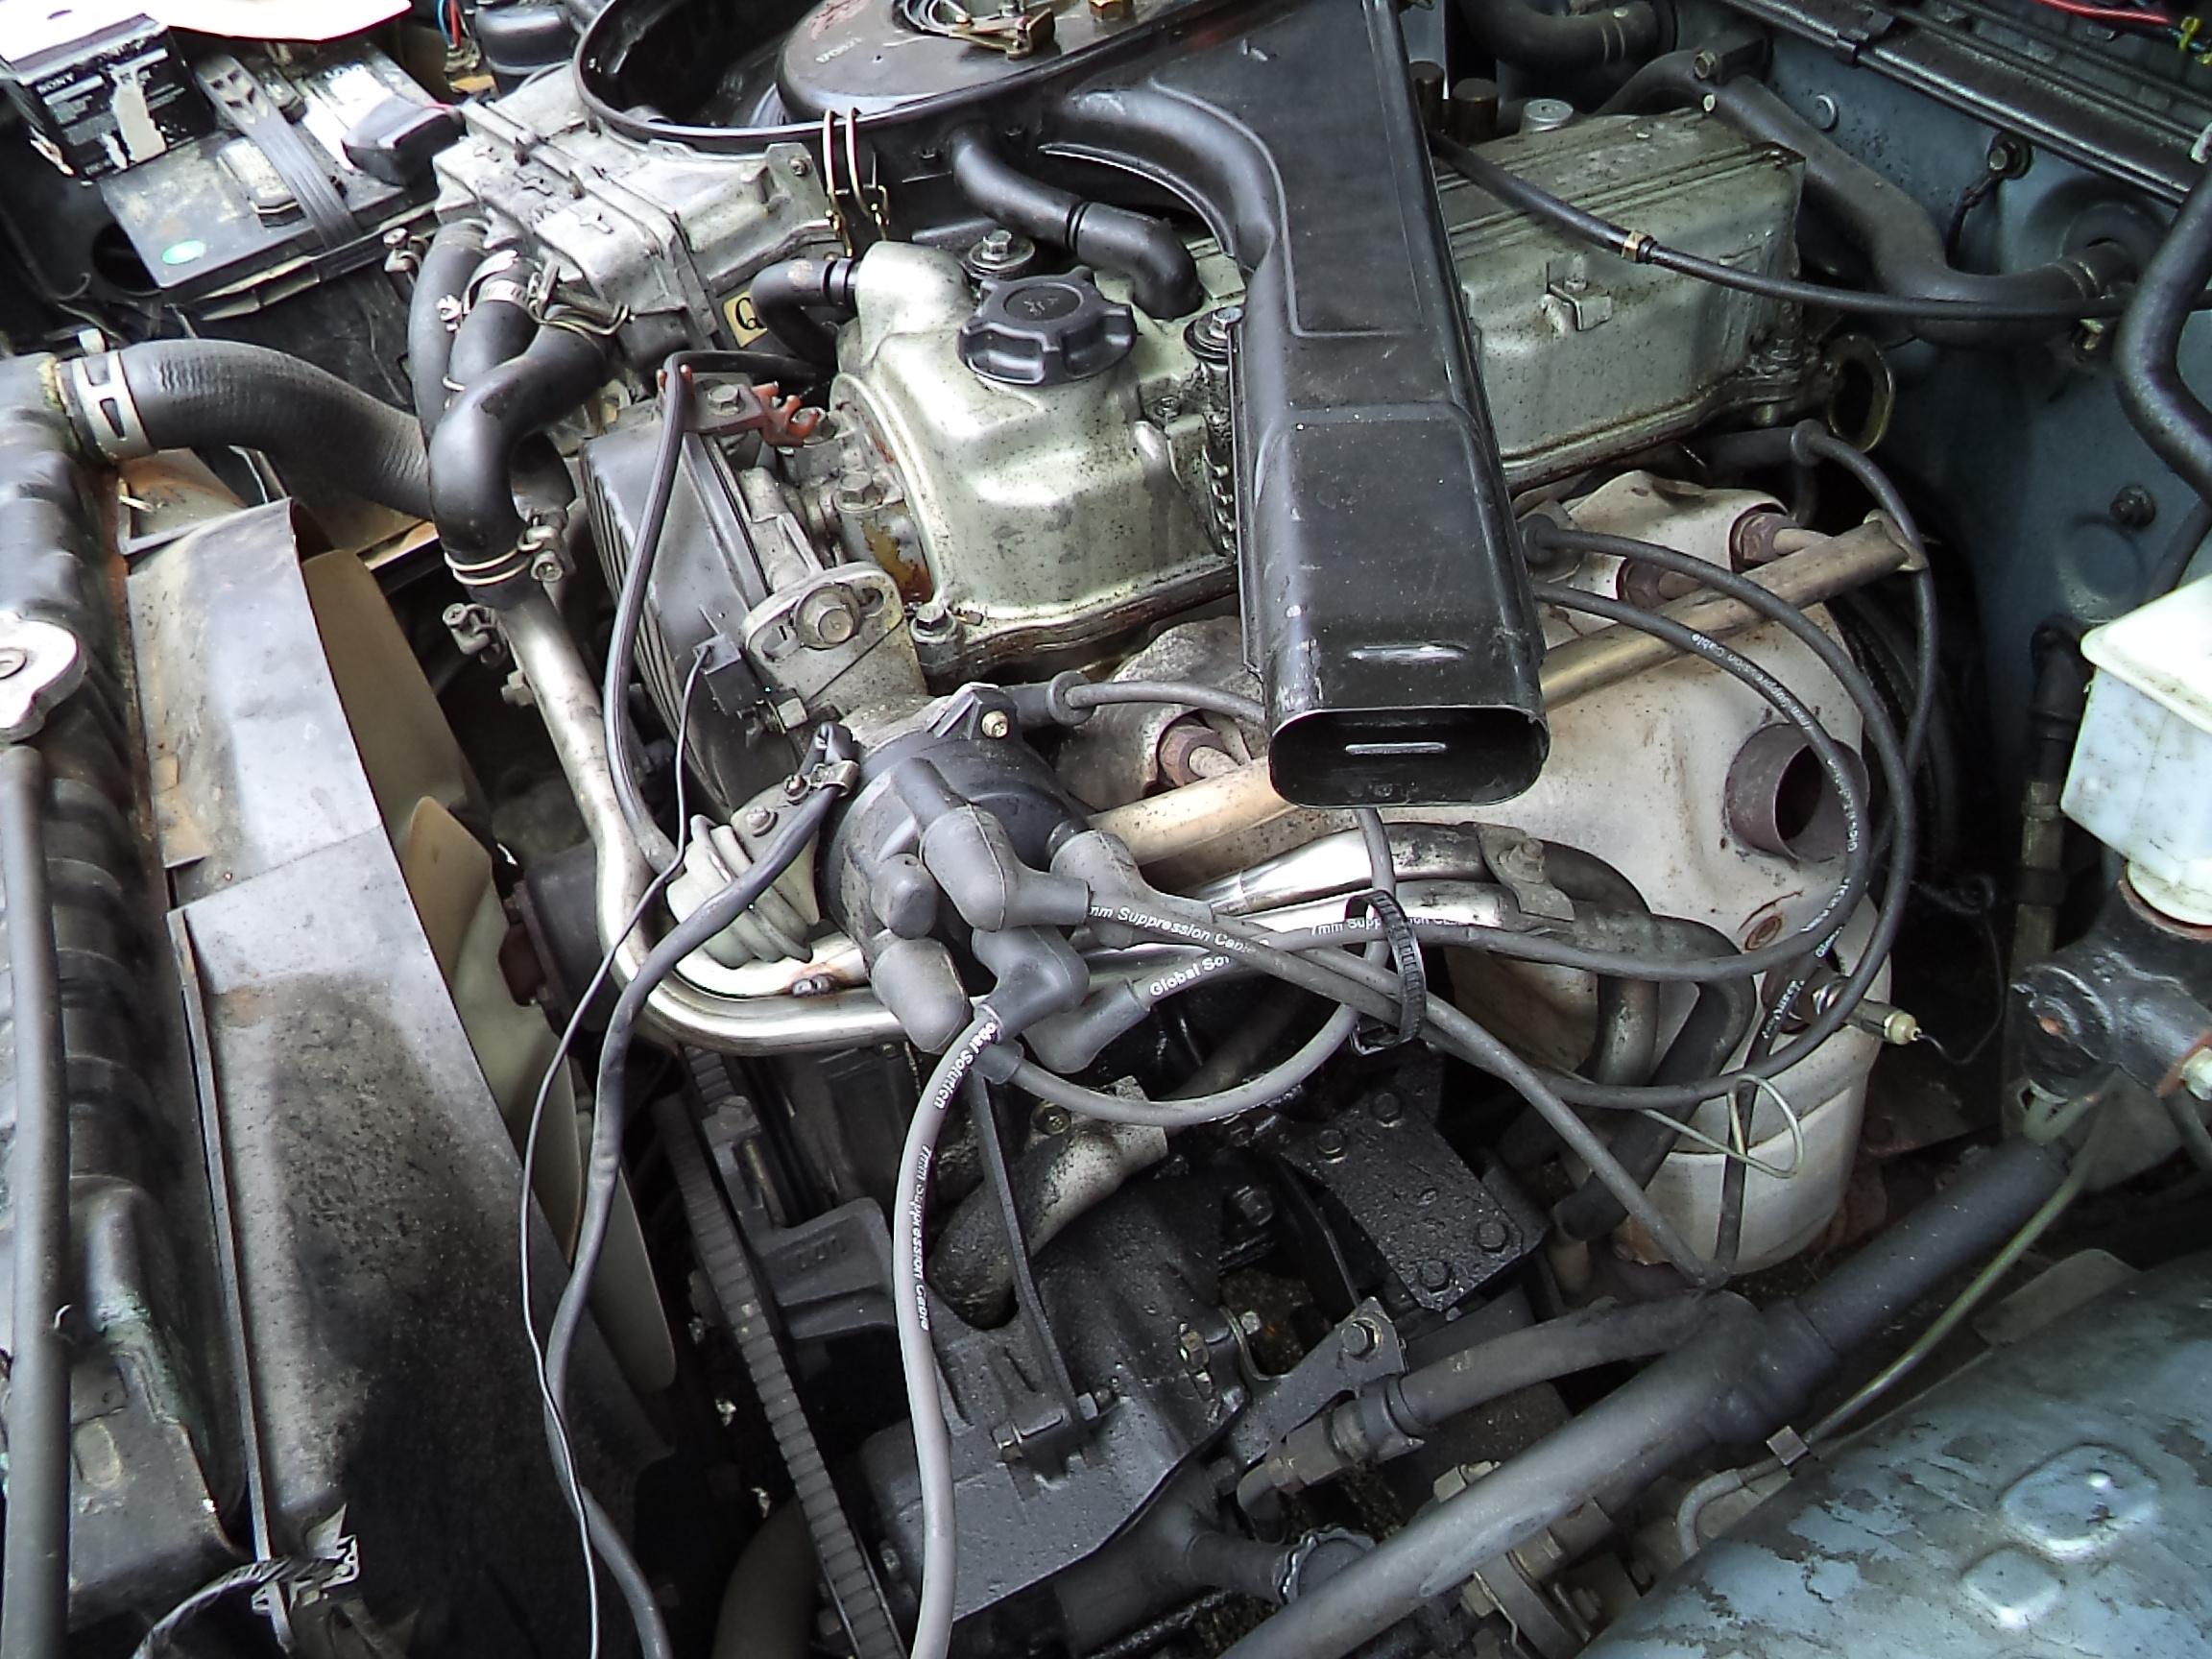 mazda b2200 carburetor diagram 1993 chevrolet c1500 wiring 1987 b2000 pick up engine 9